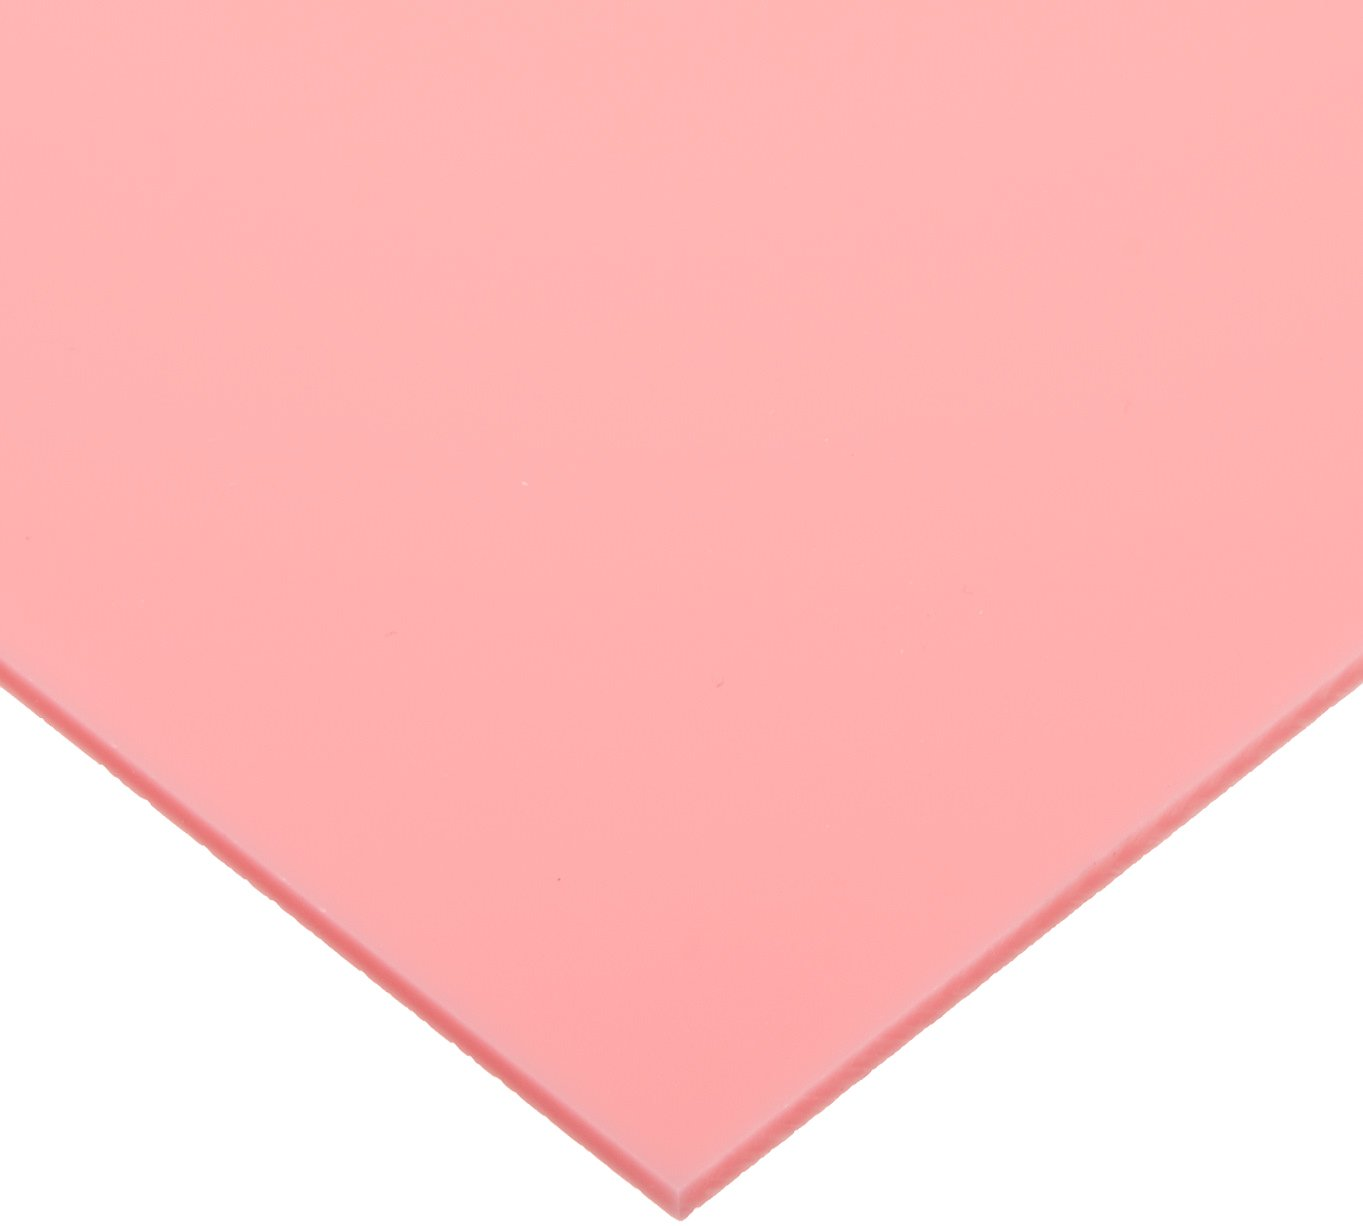 "Cast Acrylic Sheet, Translucent Pink, 12"" x 12"" x 0.118"" Size"